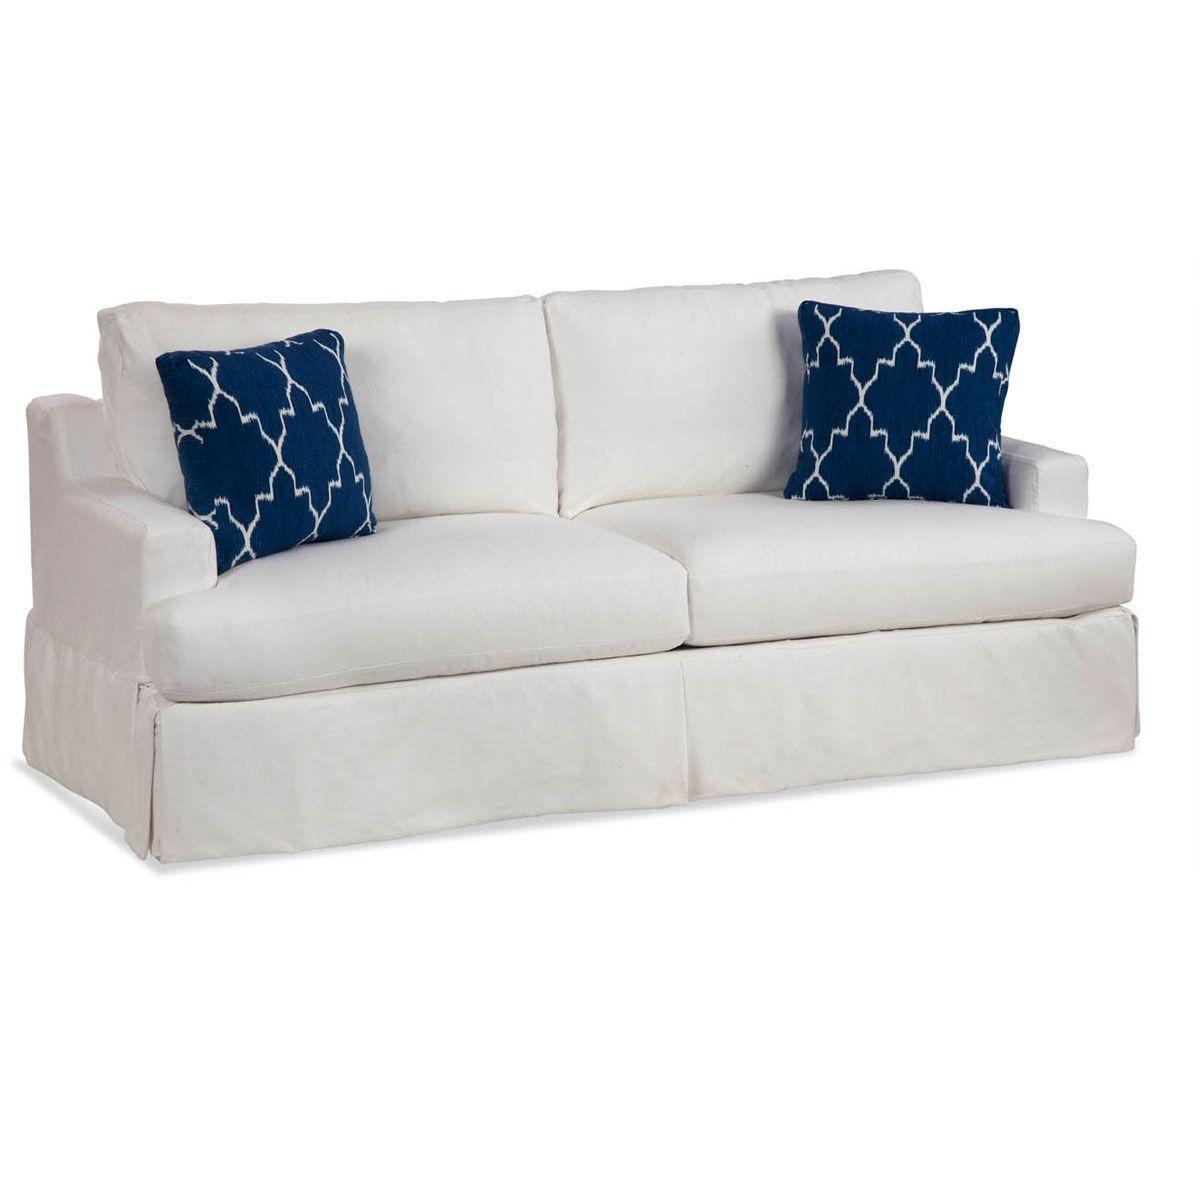 Sausalito Slipcovered Sofa Washable Slipcover Casas